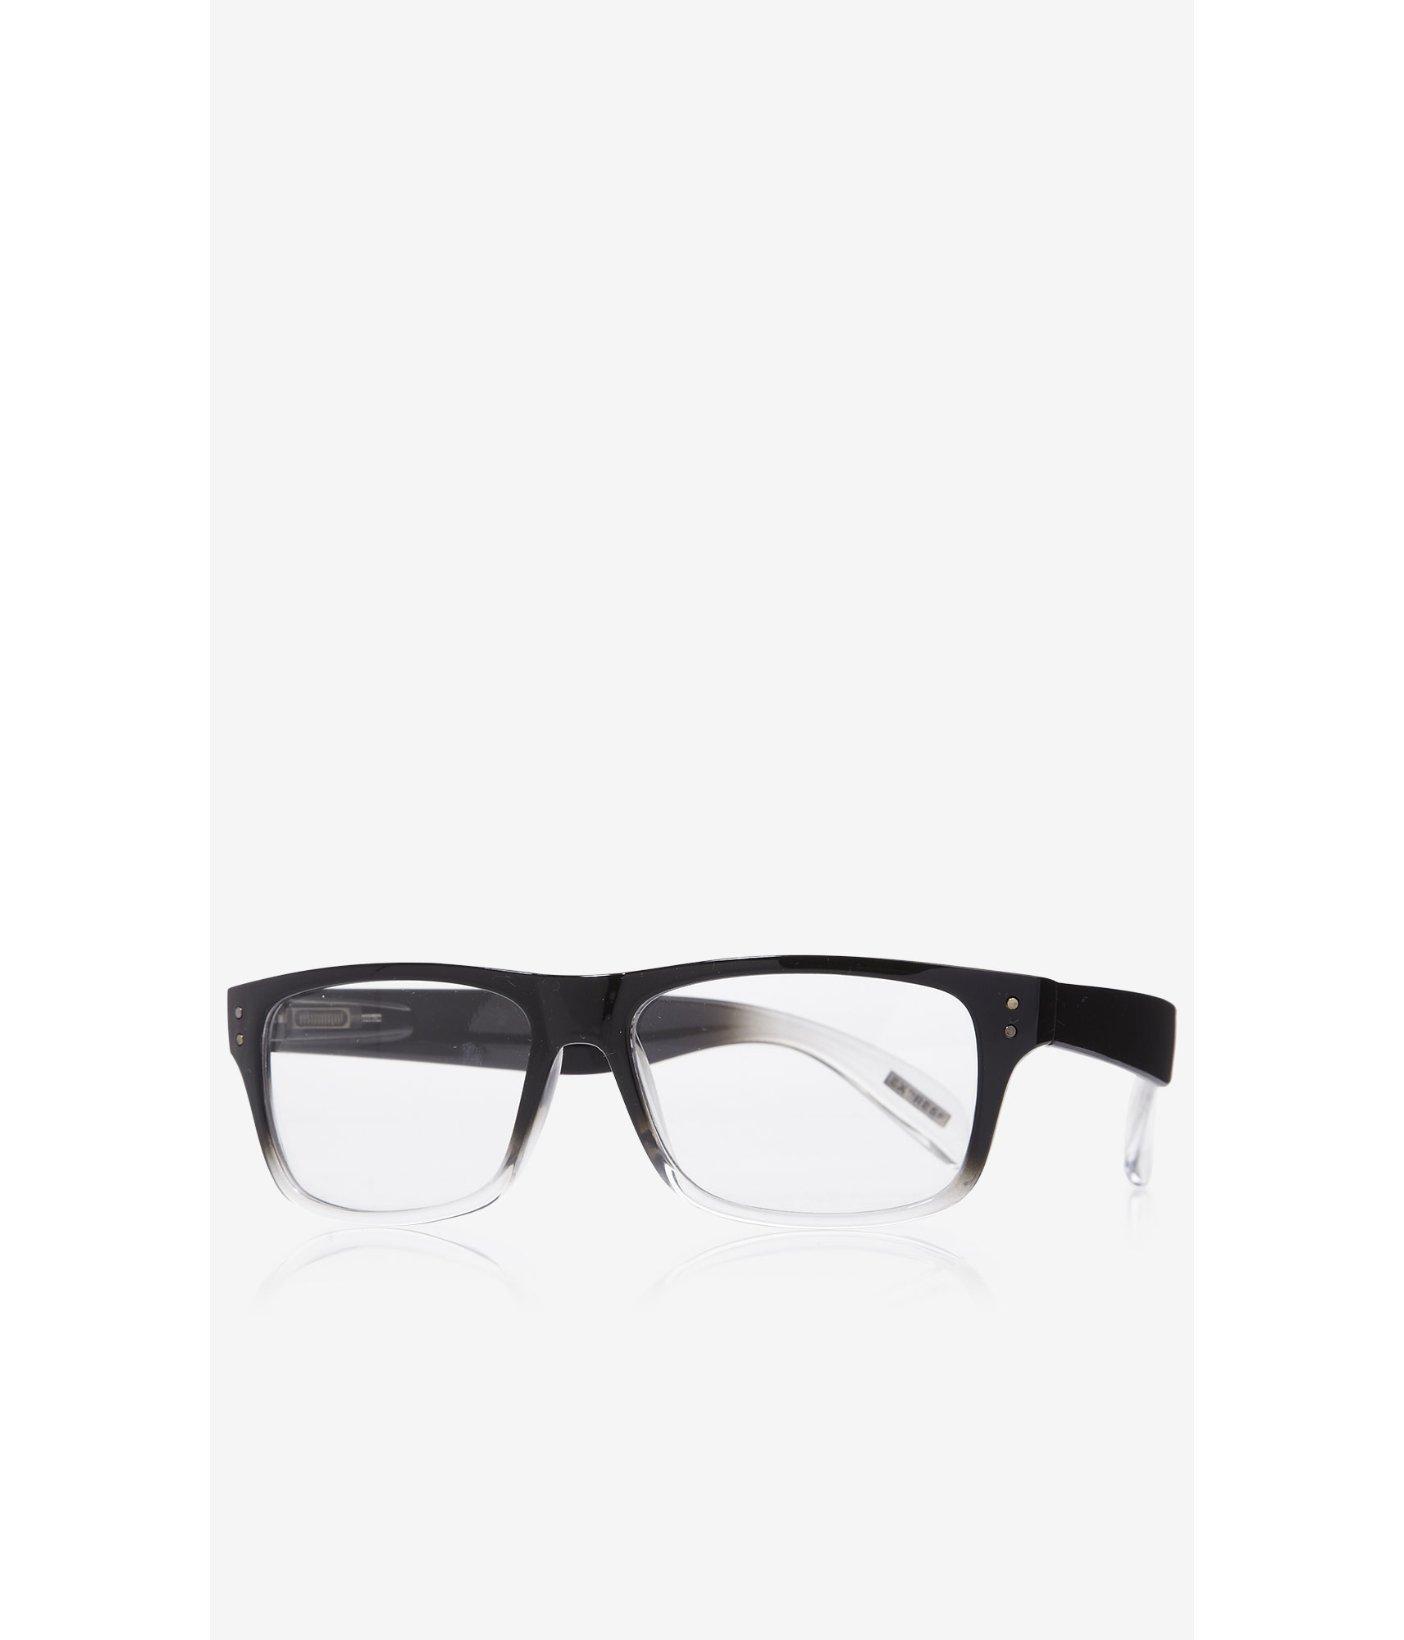 lyst express ombre highbrow frame clear lens glasses in black for men Oakley Half Jacket Sunglasses gallery men s oakley radar men s cat eye sunglasses